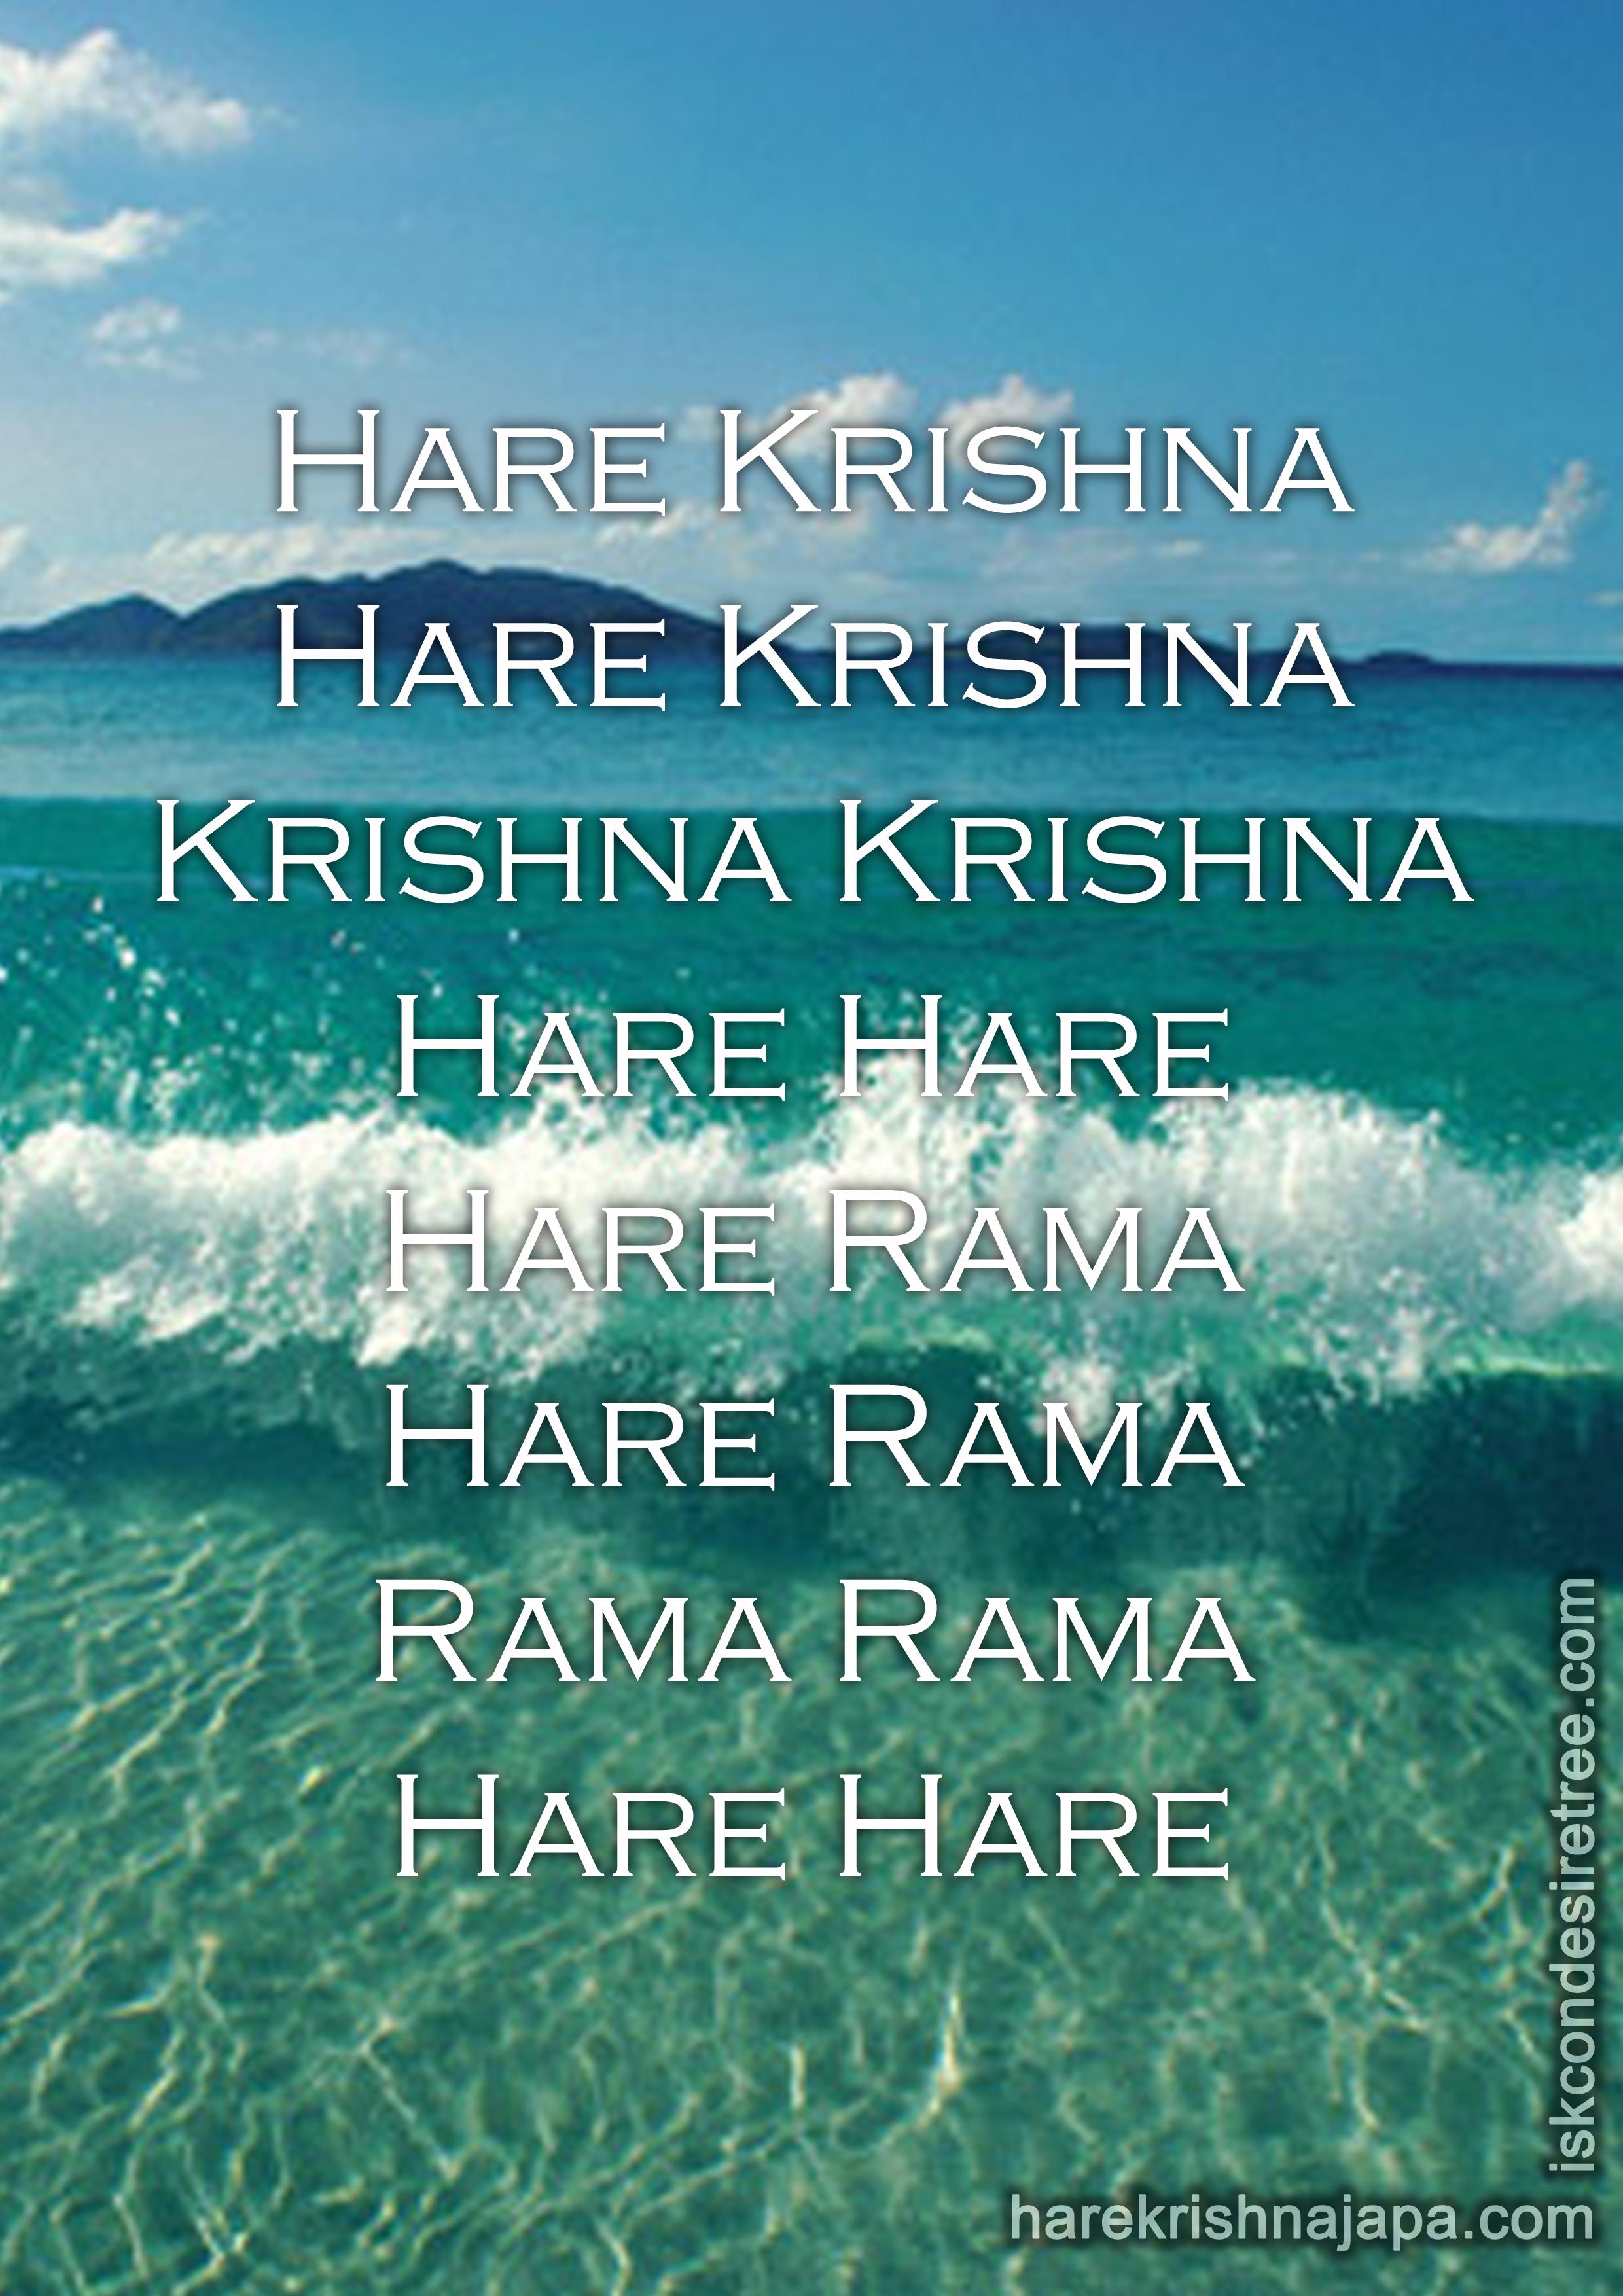 Hare Krishna Maha Mantra In Spanish 029 Hare Krishna Japa